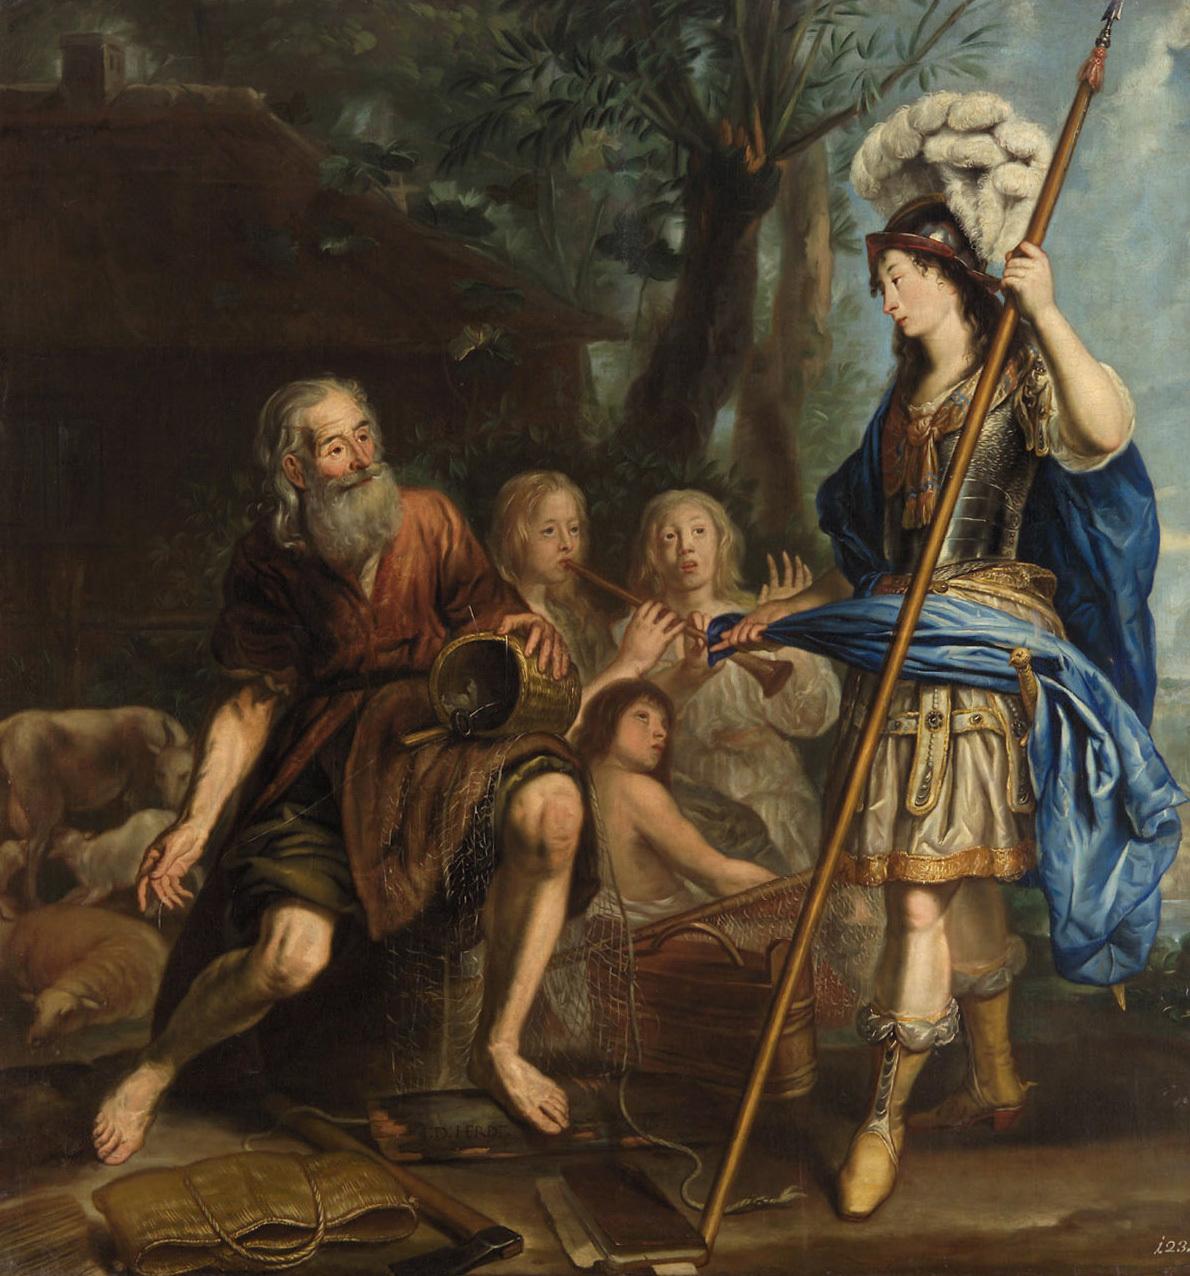 Erminia bei den Landleuten von Jan de Herdt